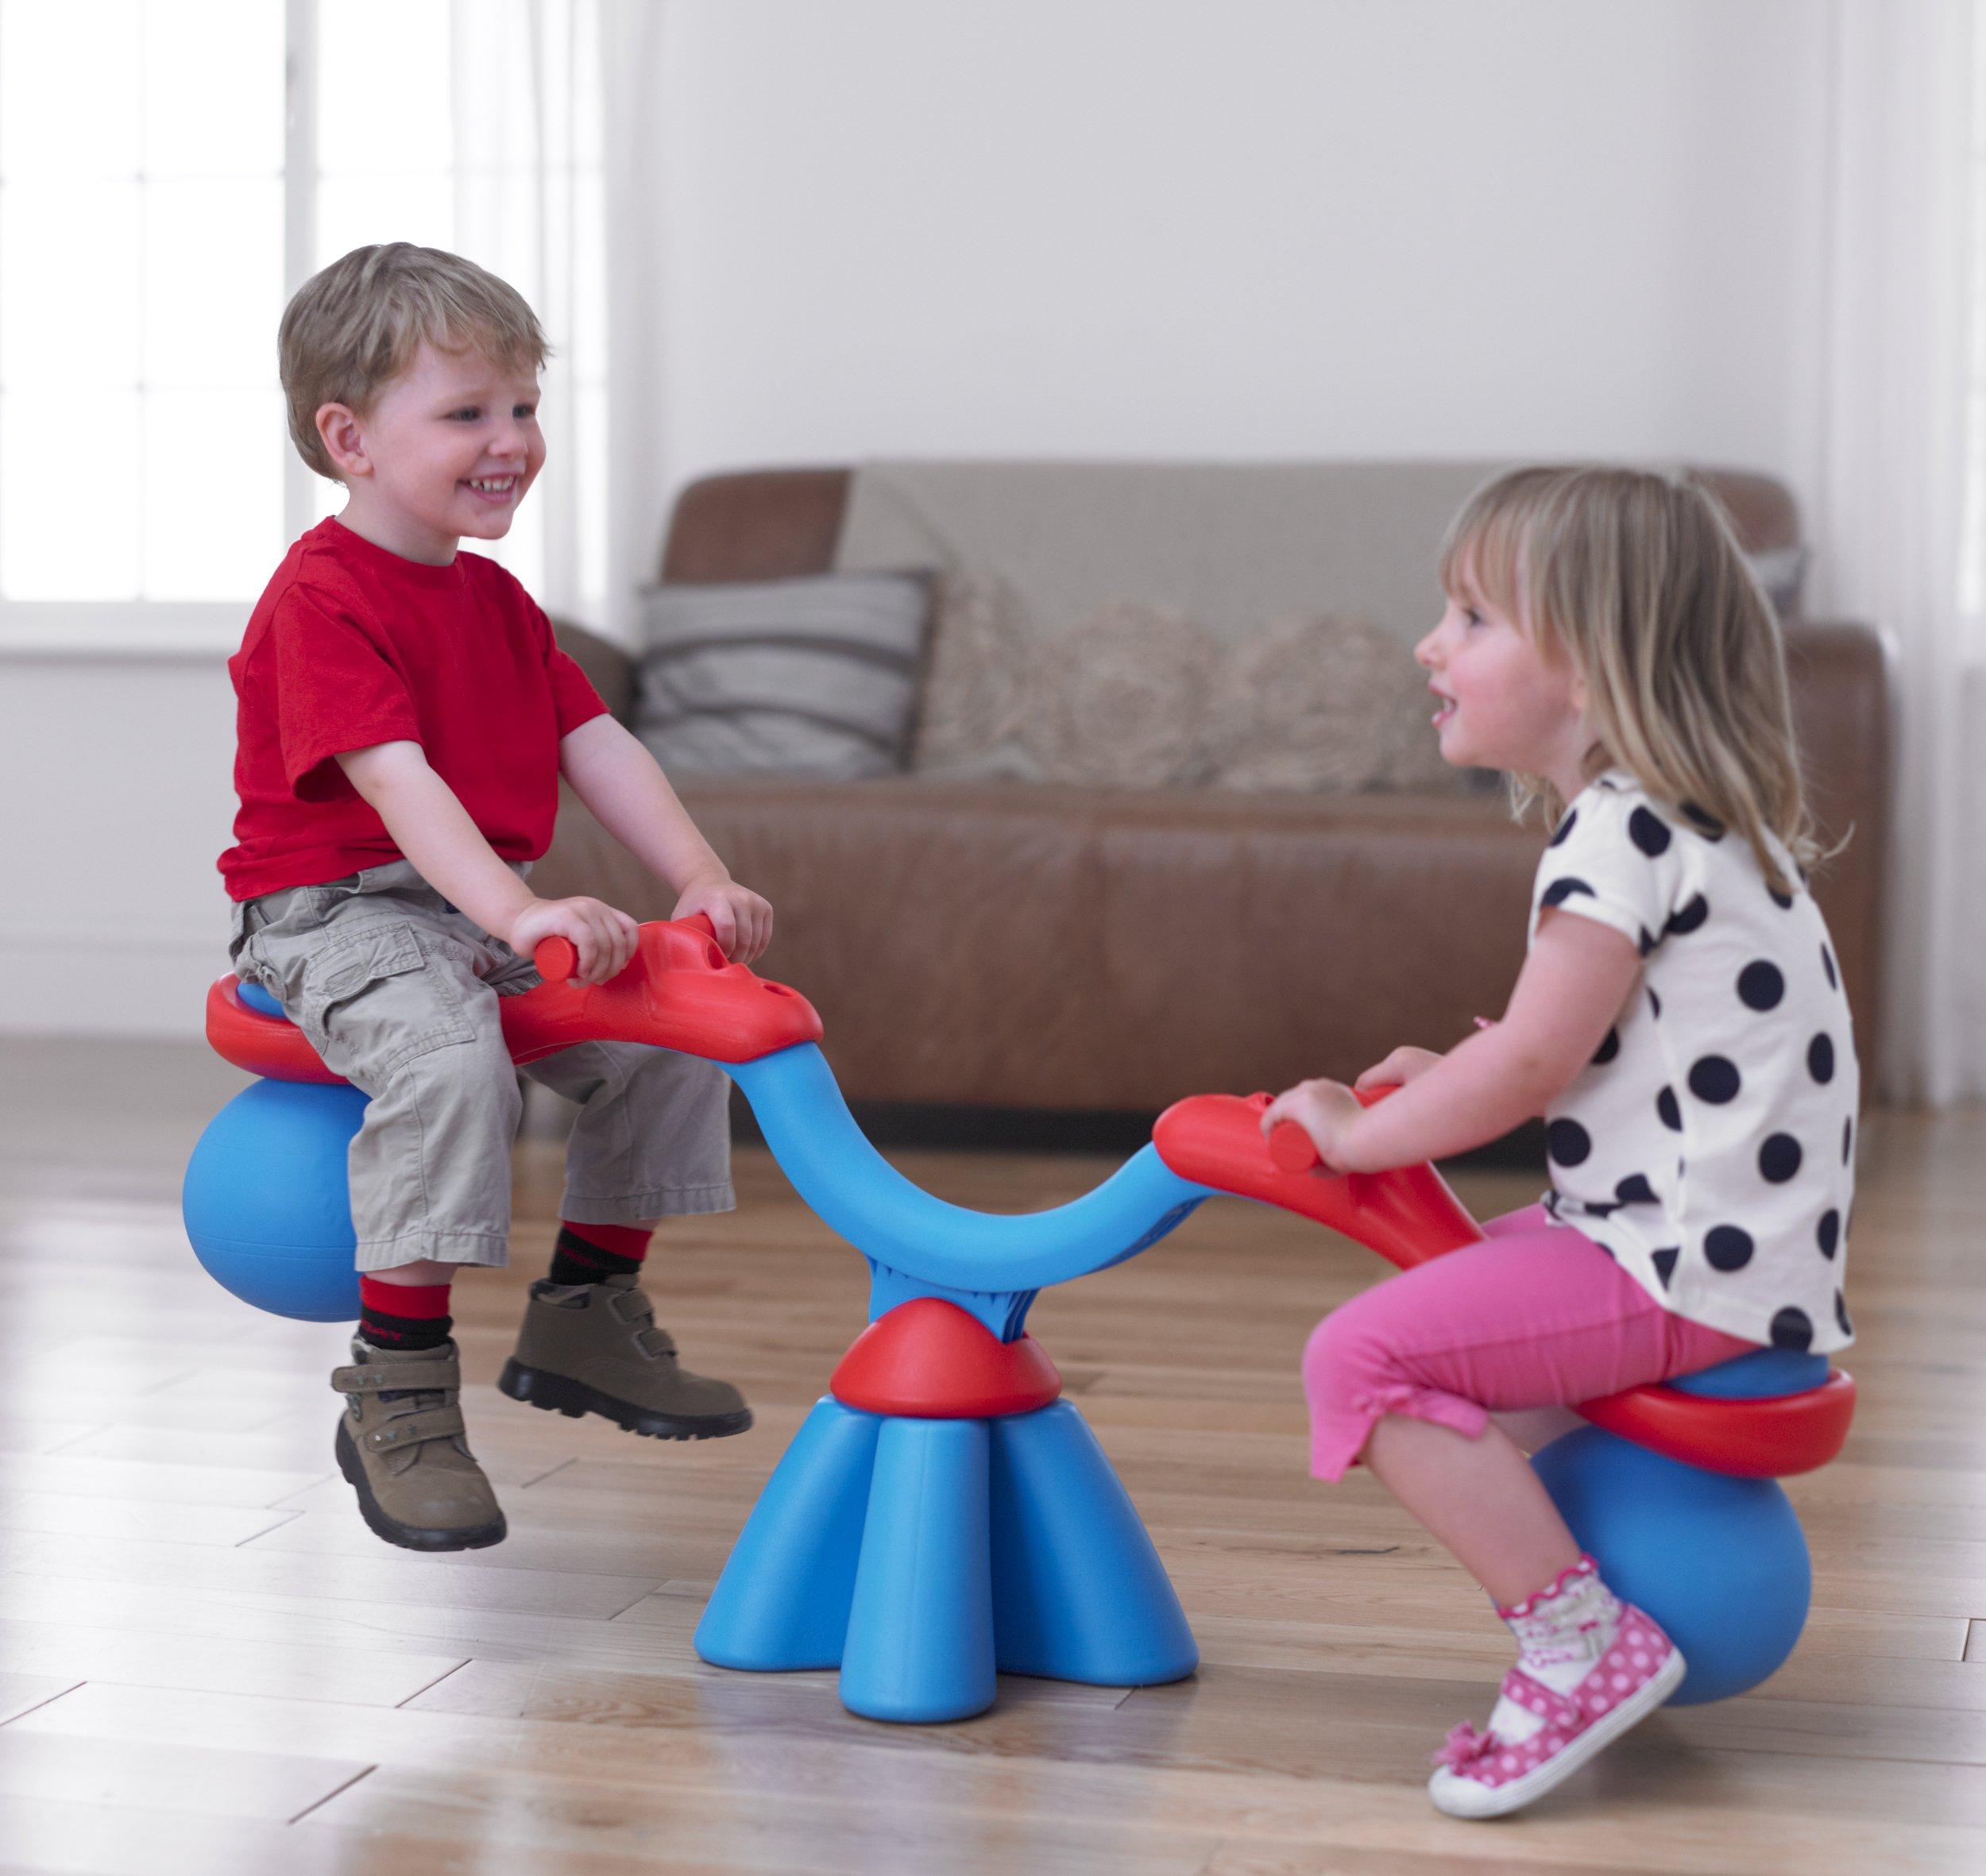 TP Toys TP Activity Spiro Bouncer